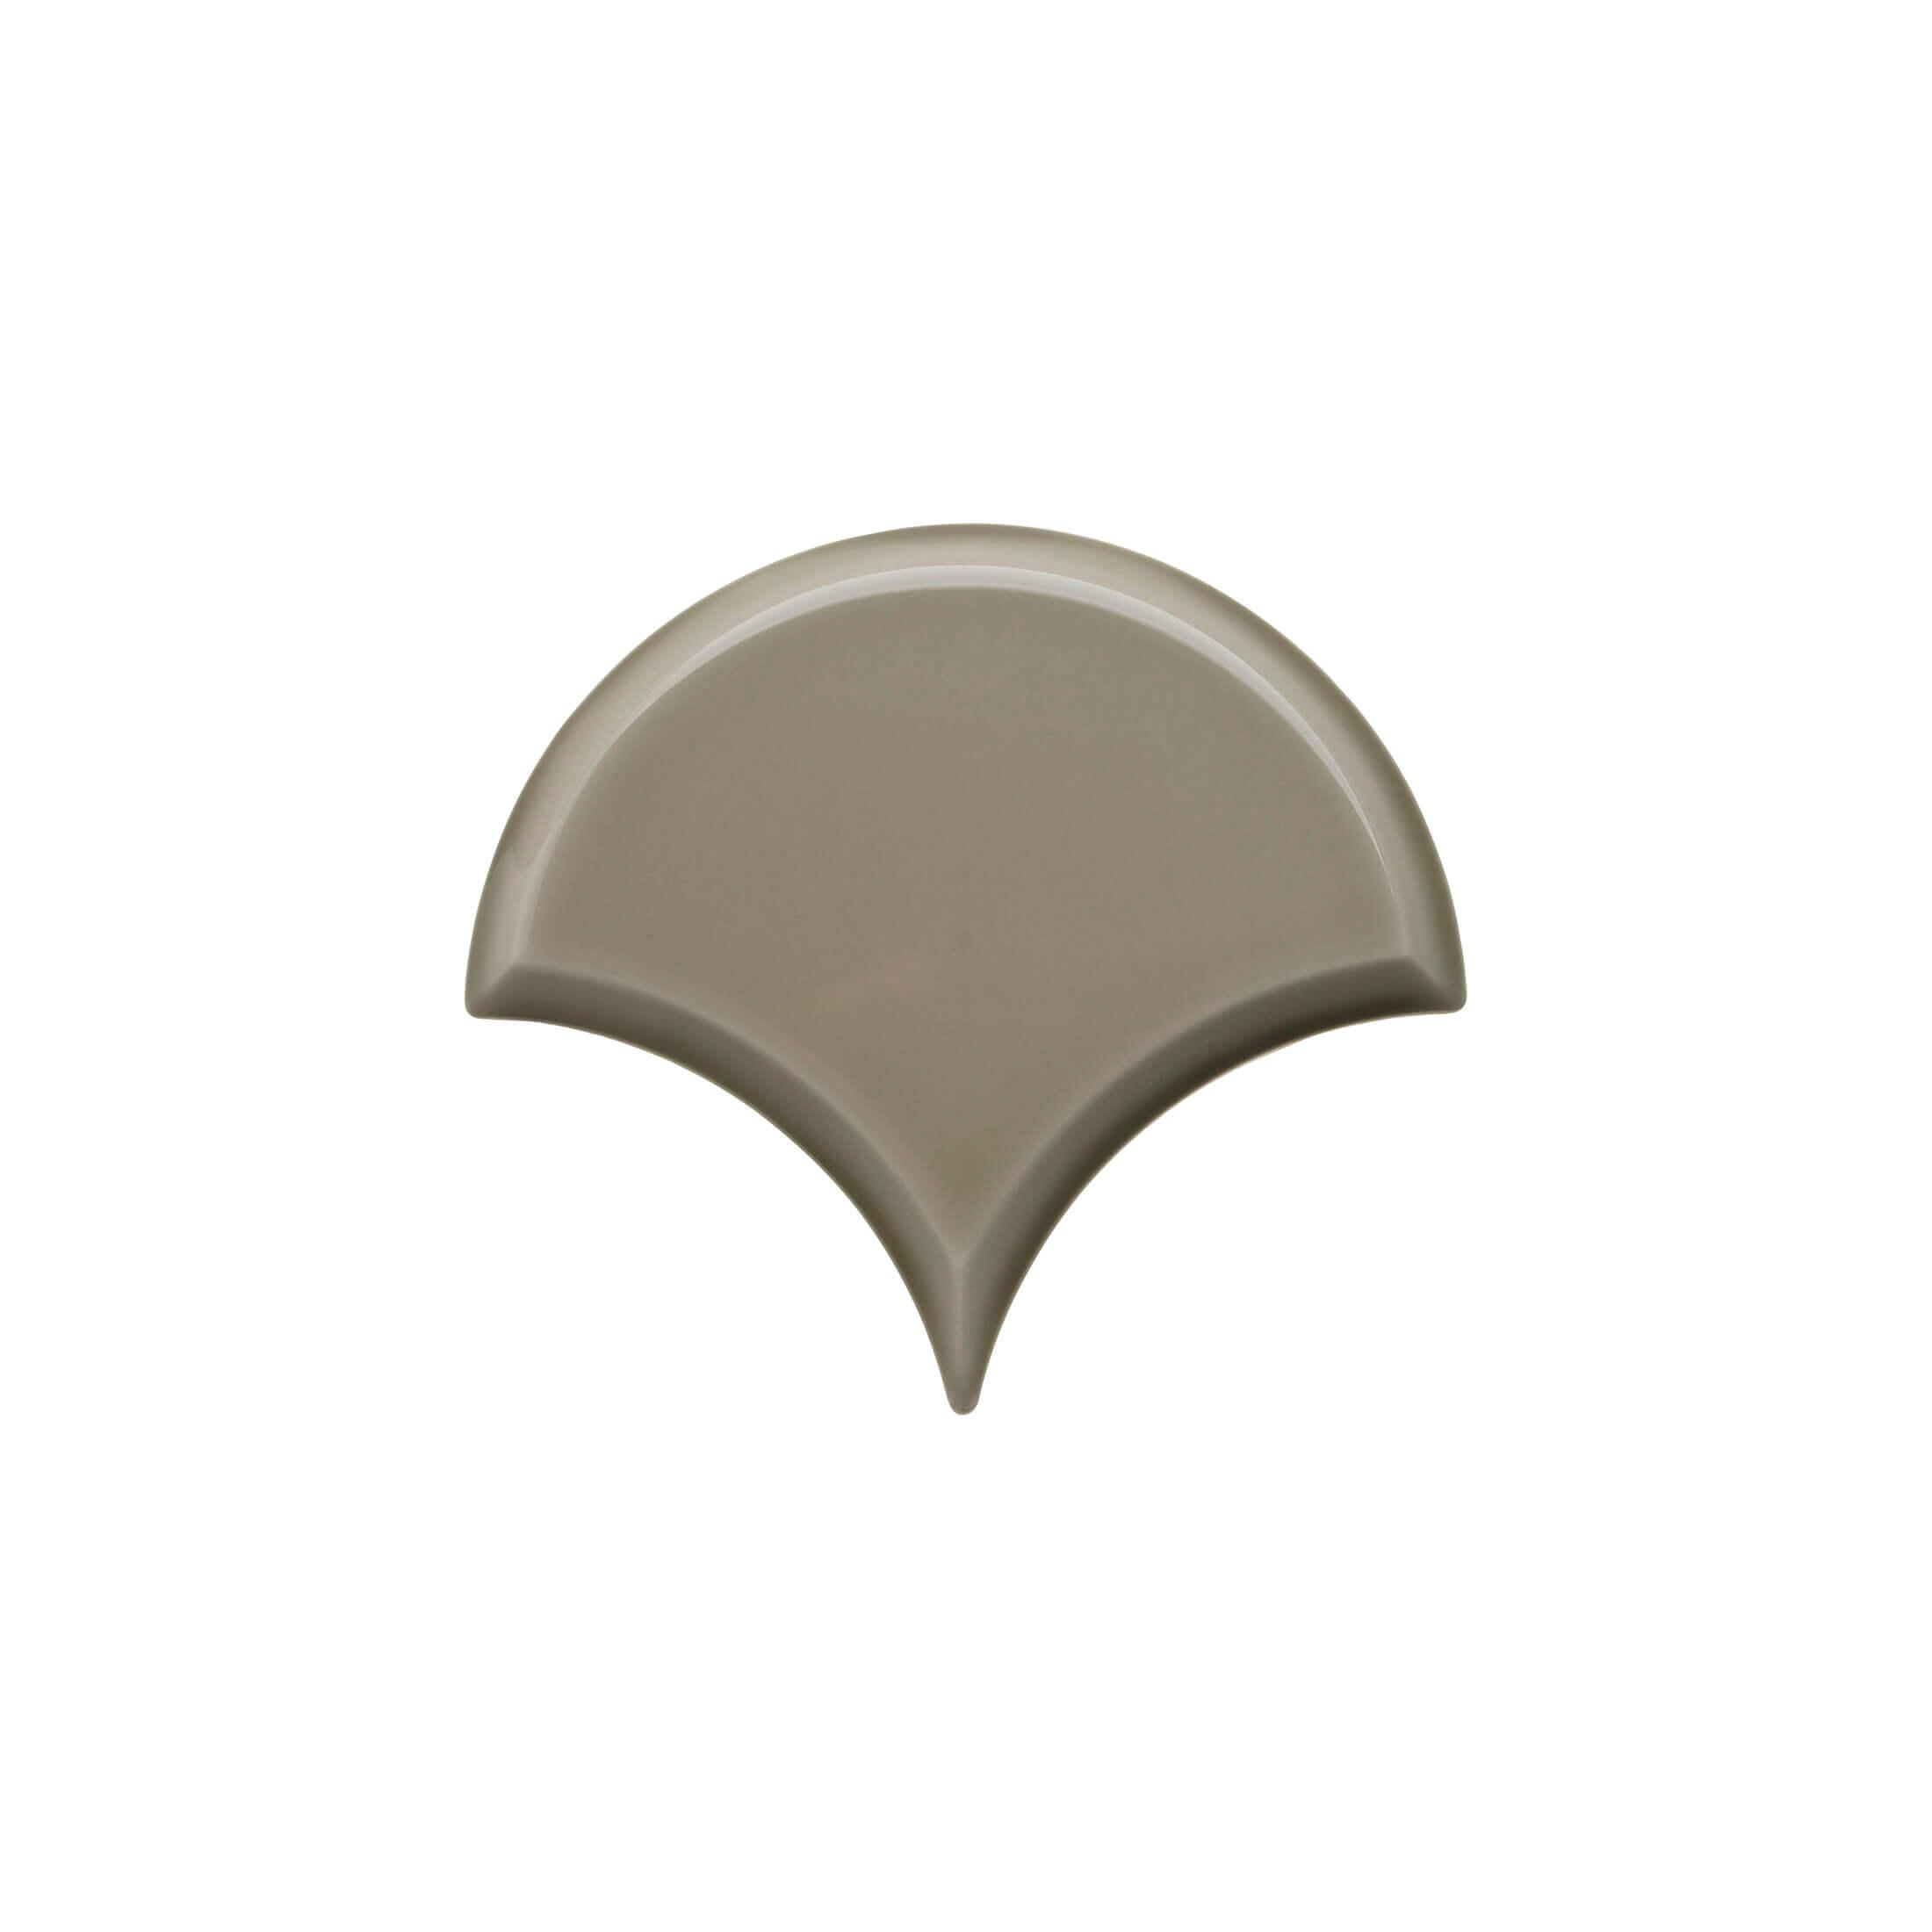 ADST8018 - 13 cm X 15 cm